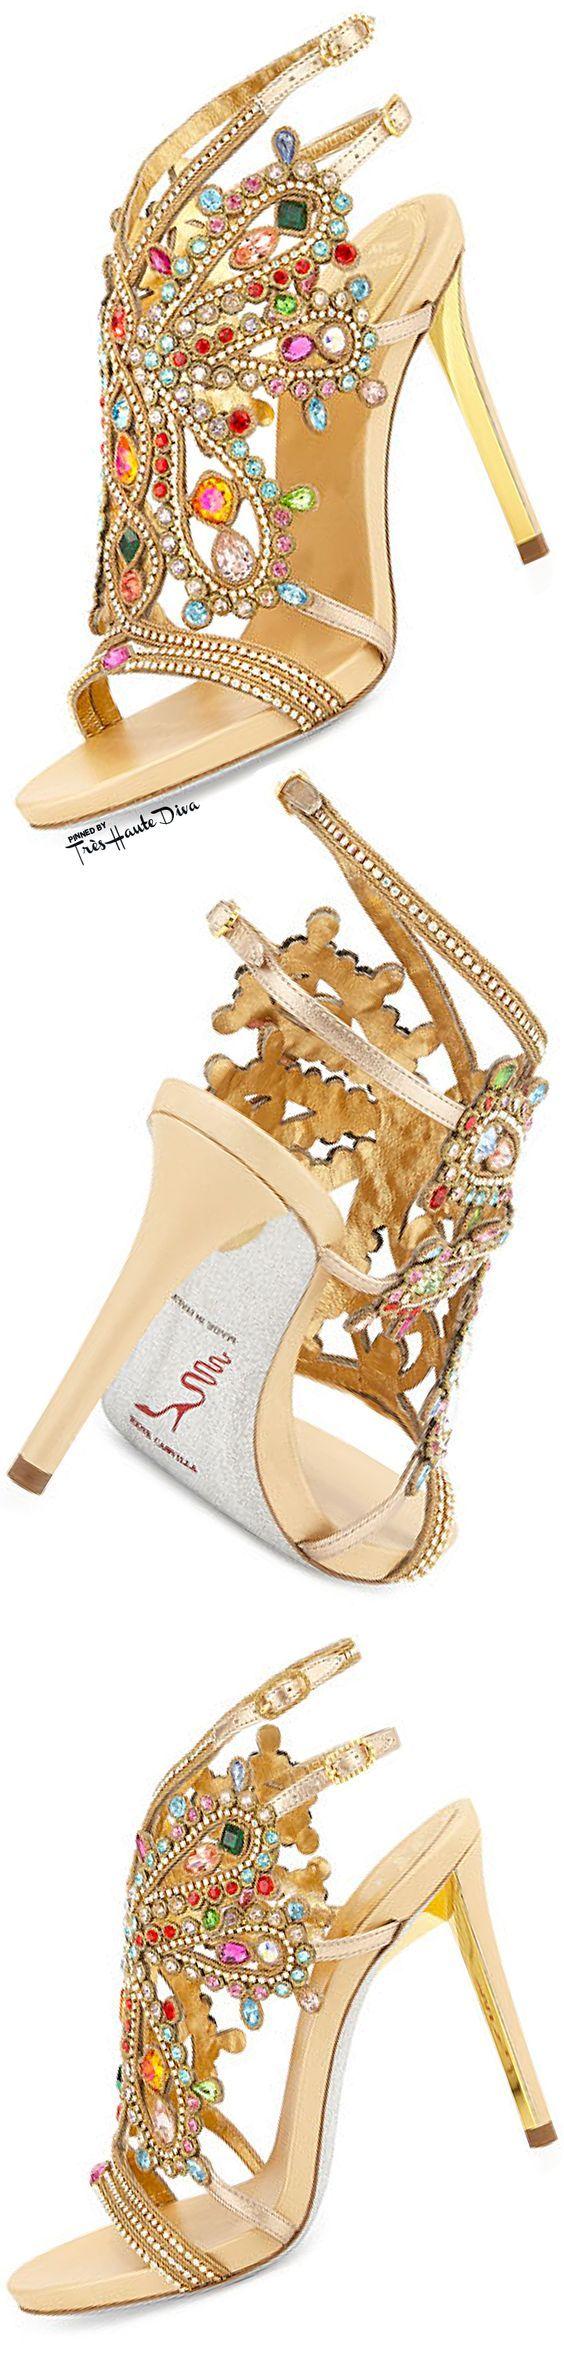 Rene Caovilla Multi-Jeweled Heels♥✿♥ Pure Lust beim Laufen! Accessoires w… – Jennifer Castro